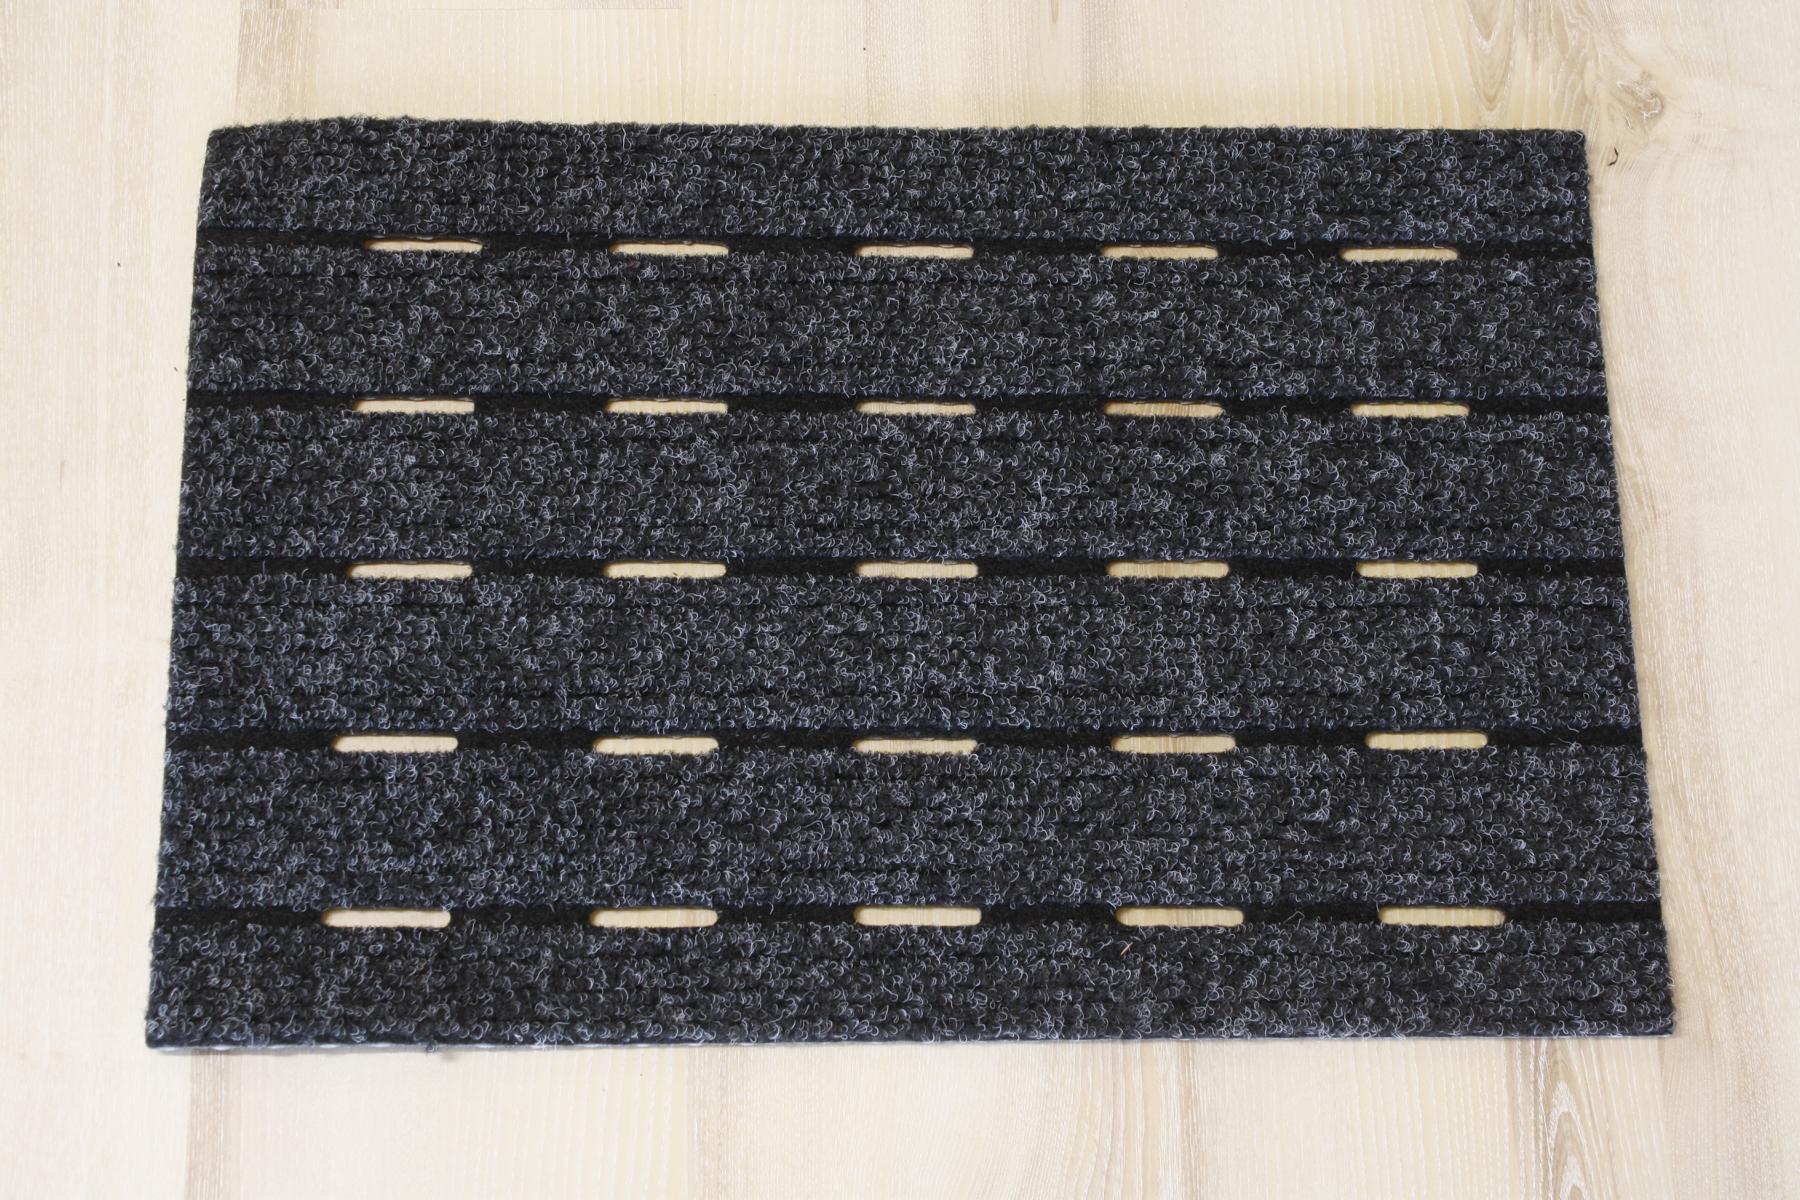 fu matte t rmatte schlitze drainage schwarz grau 40x60cm ebay. Black Bedroom Furniture Sets. Home Design Ideas